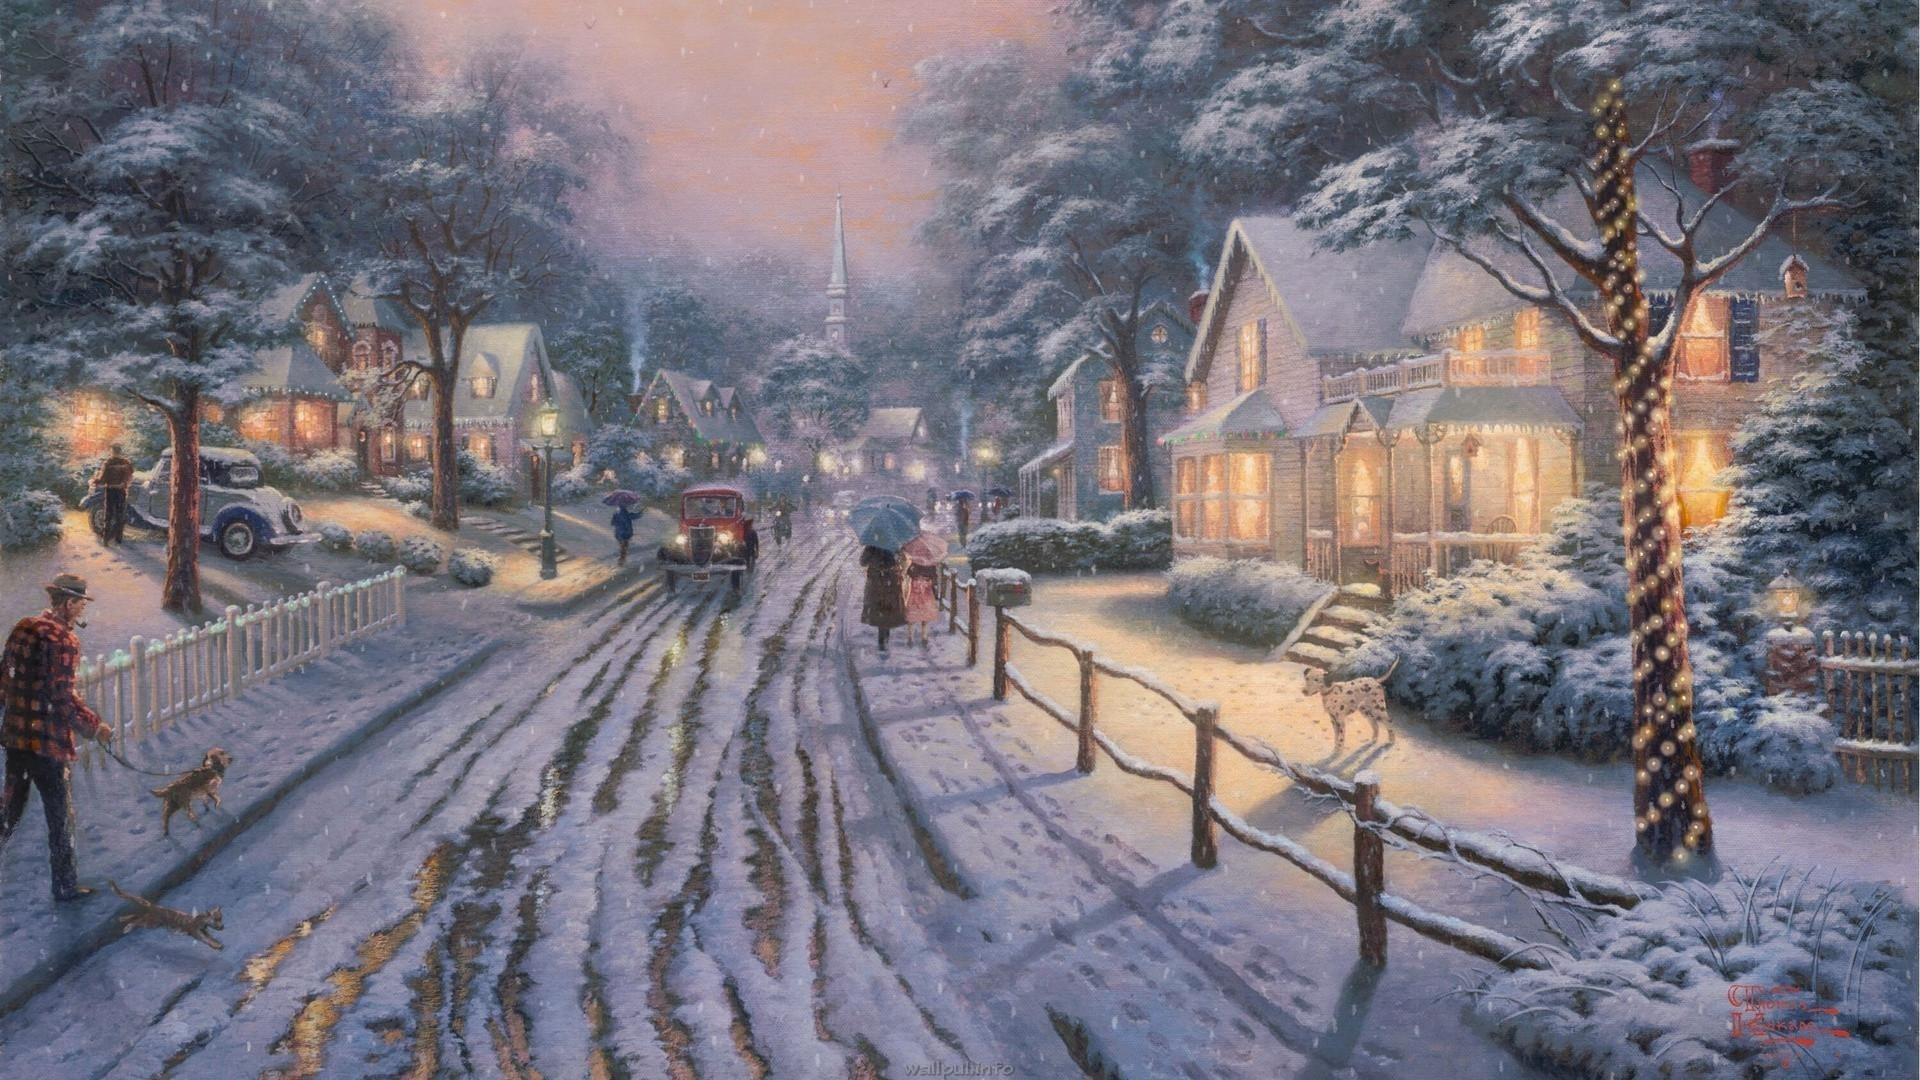 Celebration Winter Wallpaper Computer Backgrounds Download 2560x1440 Snowy Desktop 3D